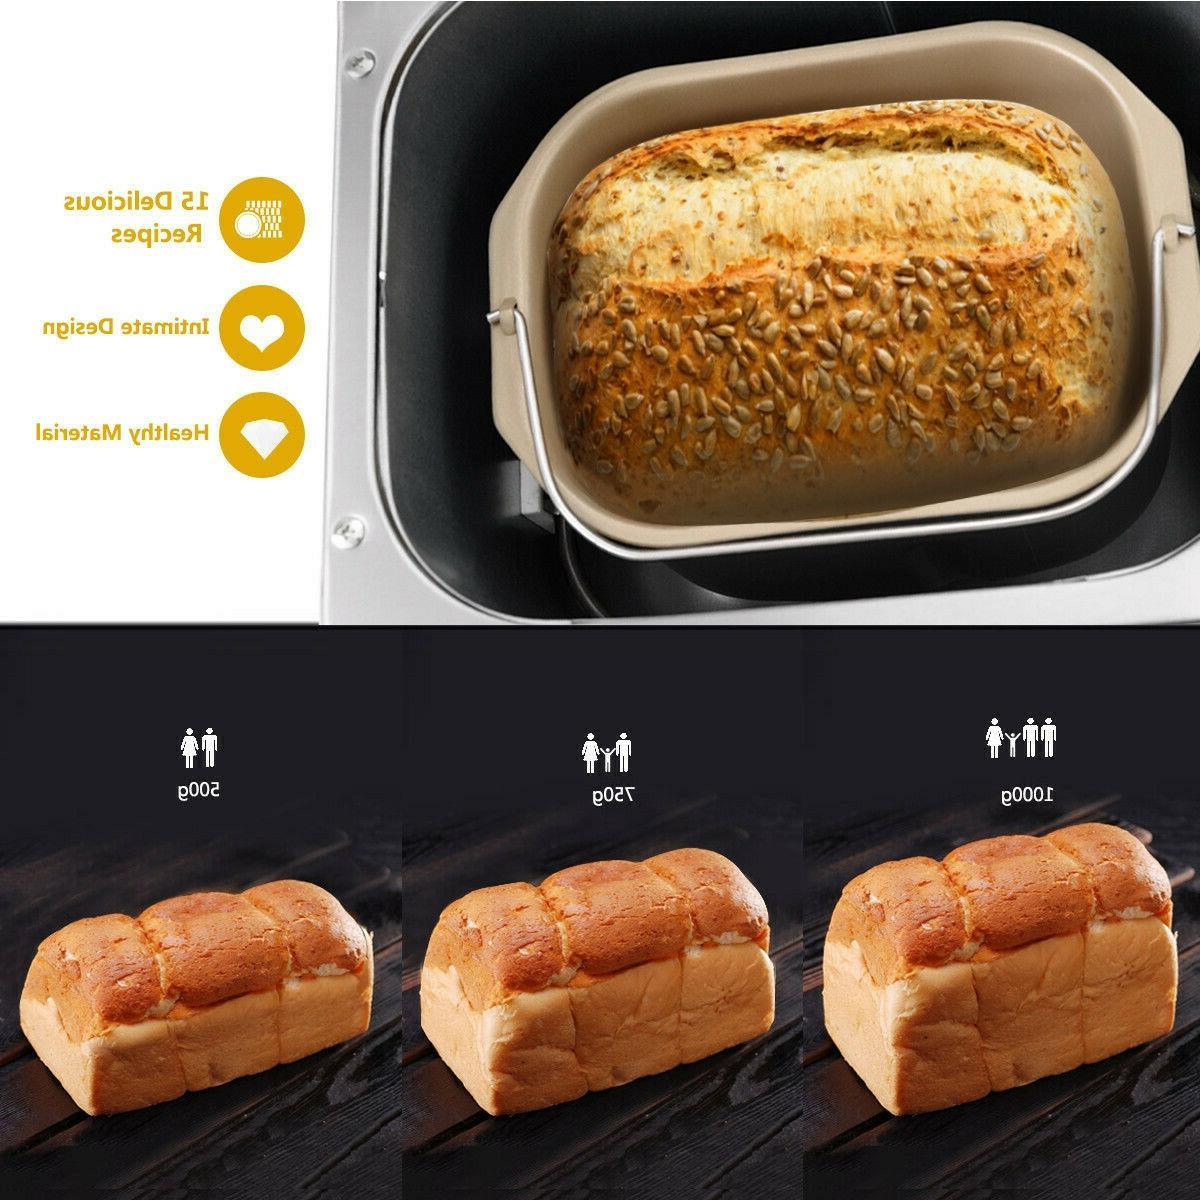 Maquina automatica hacer pan de inoxidable para pan